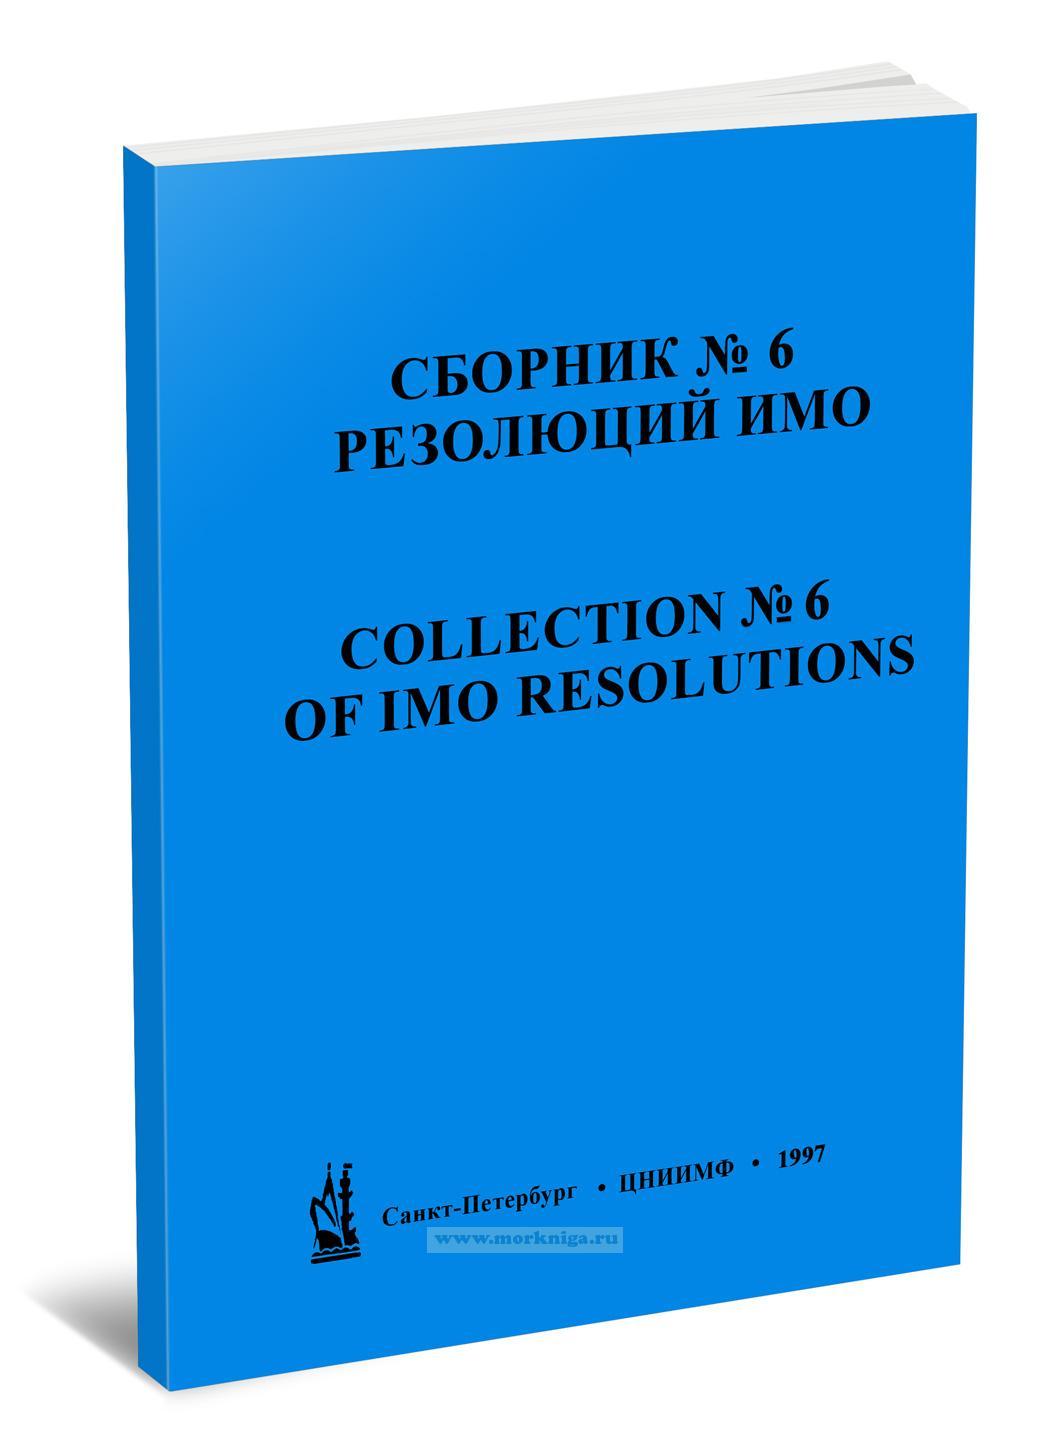 Сборник № 6 резолюций ИМО. Collection No.6 of IMO Resolutions